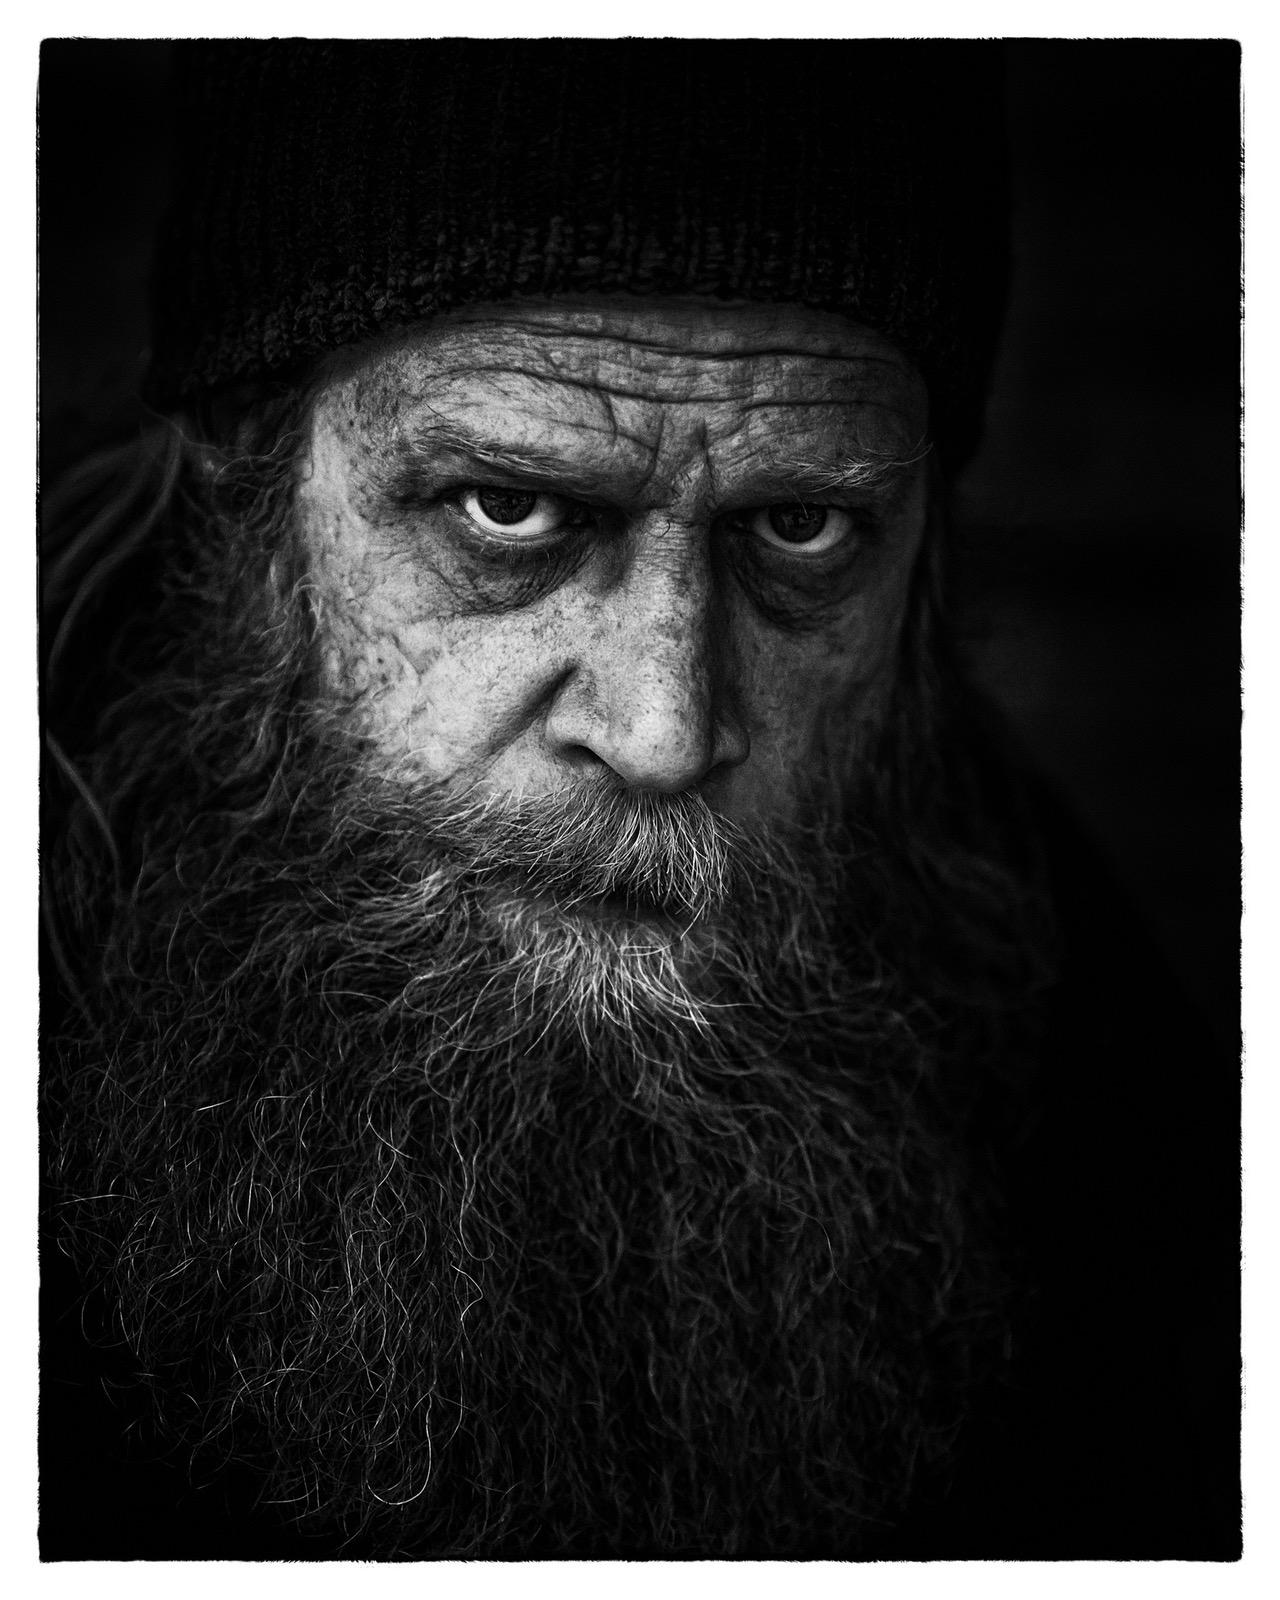 photo by Leroy Skalstad